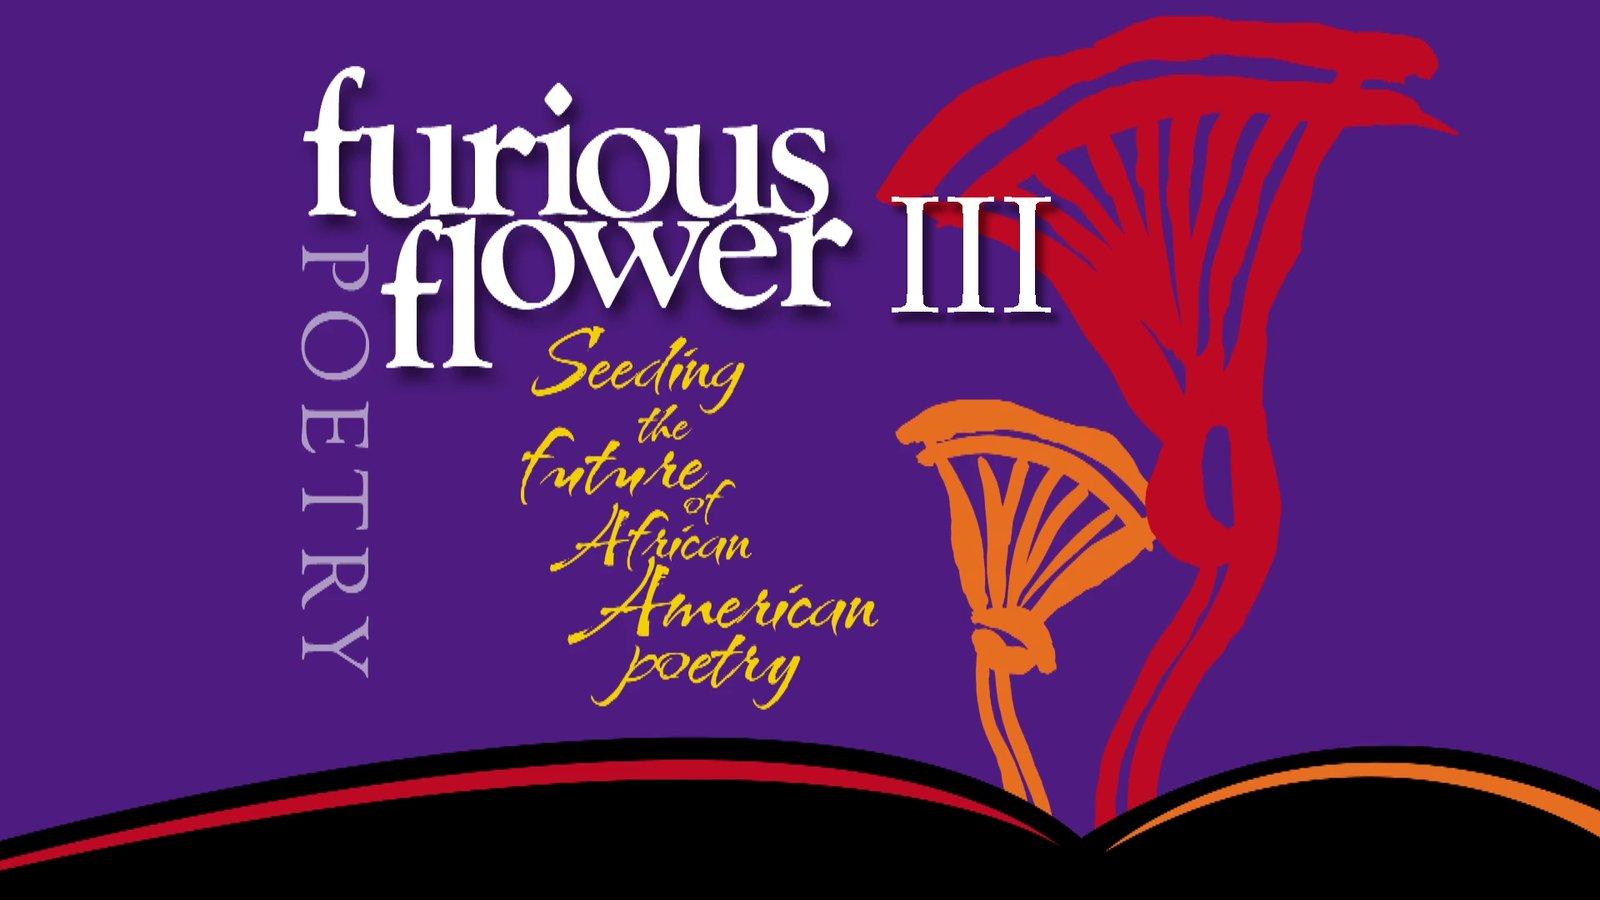 Furious Flower III